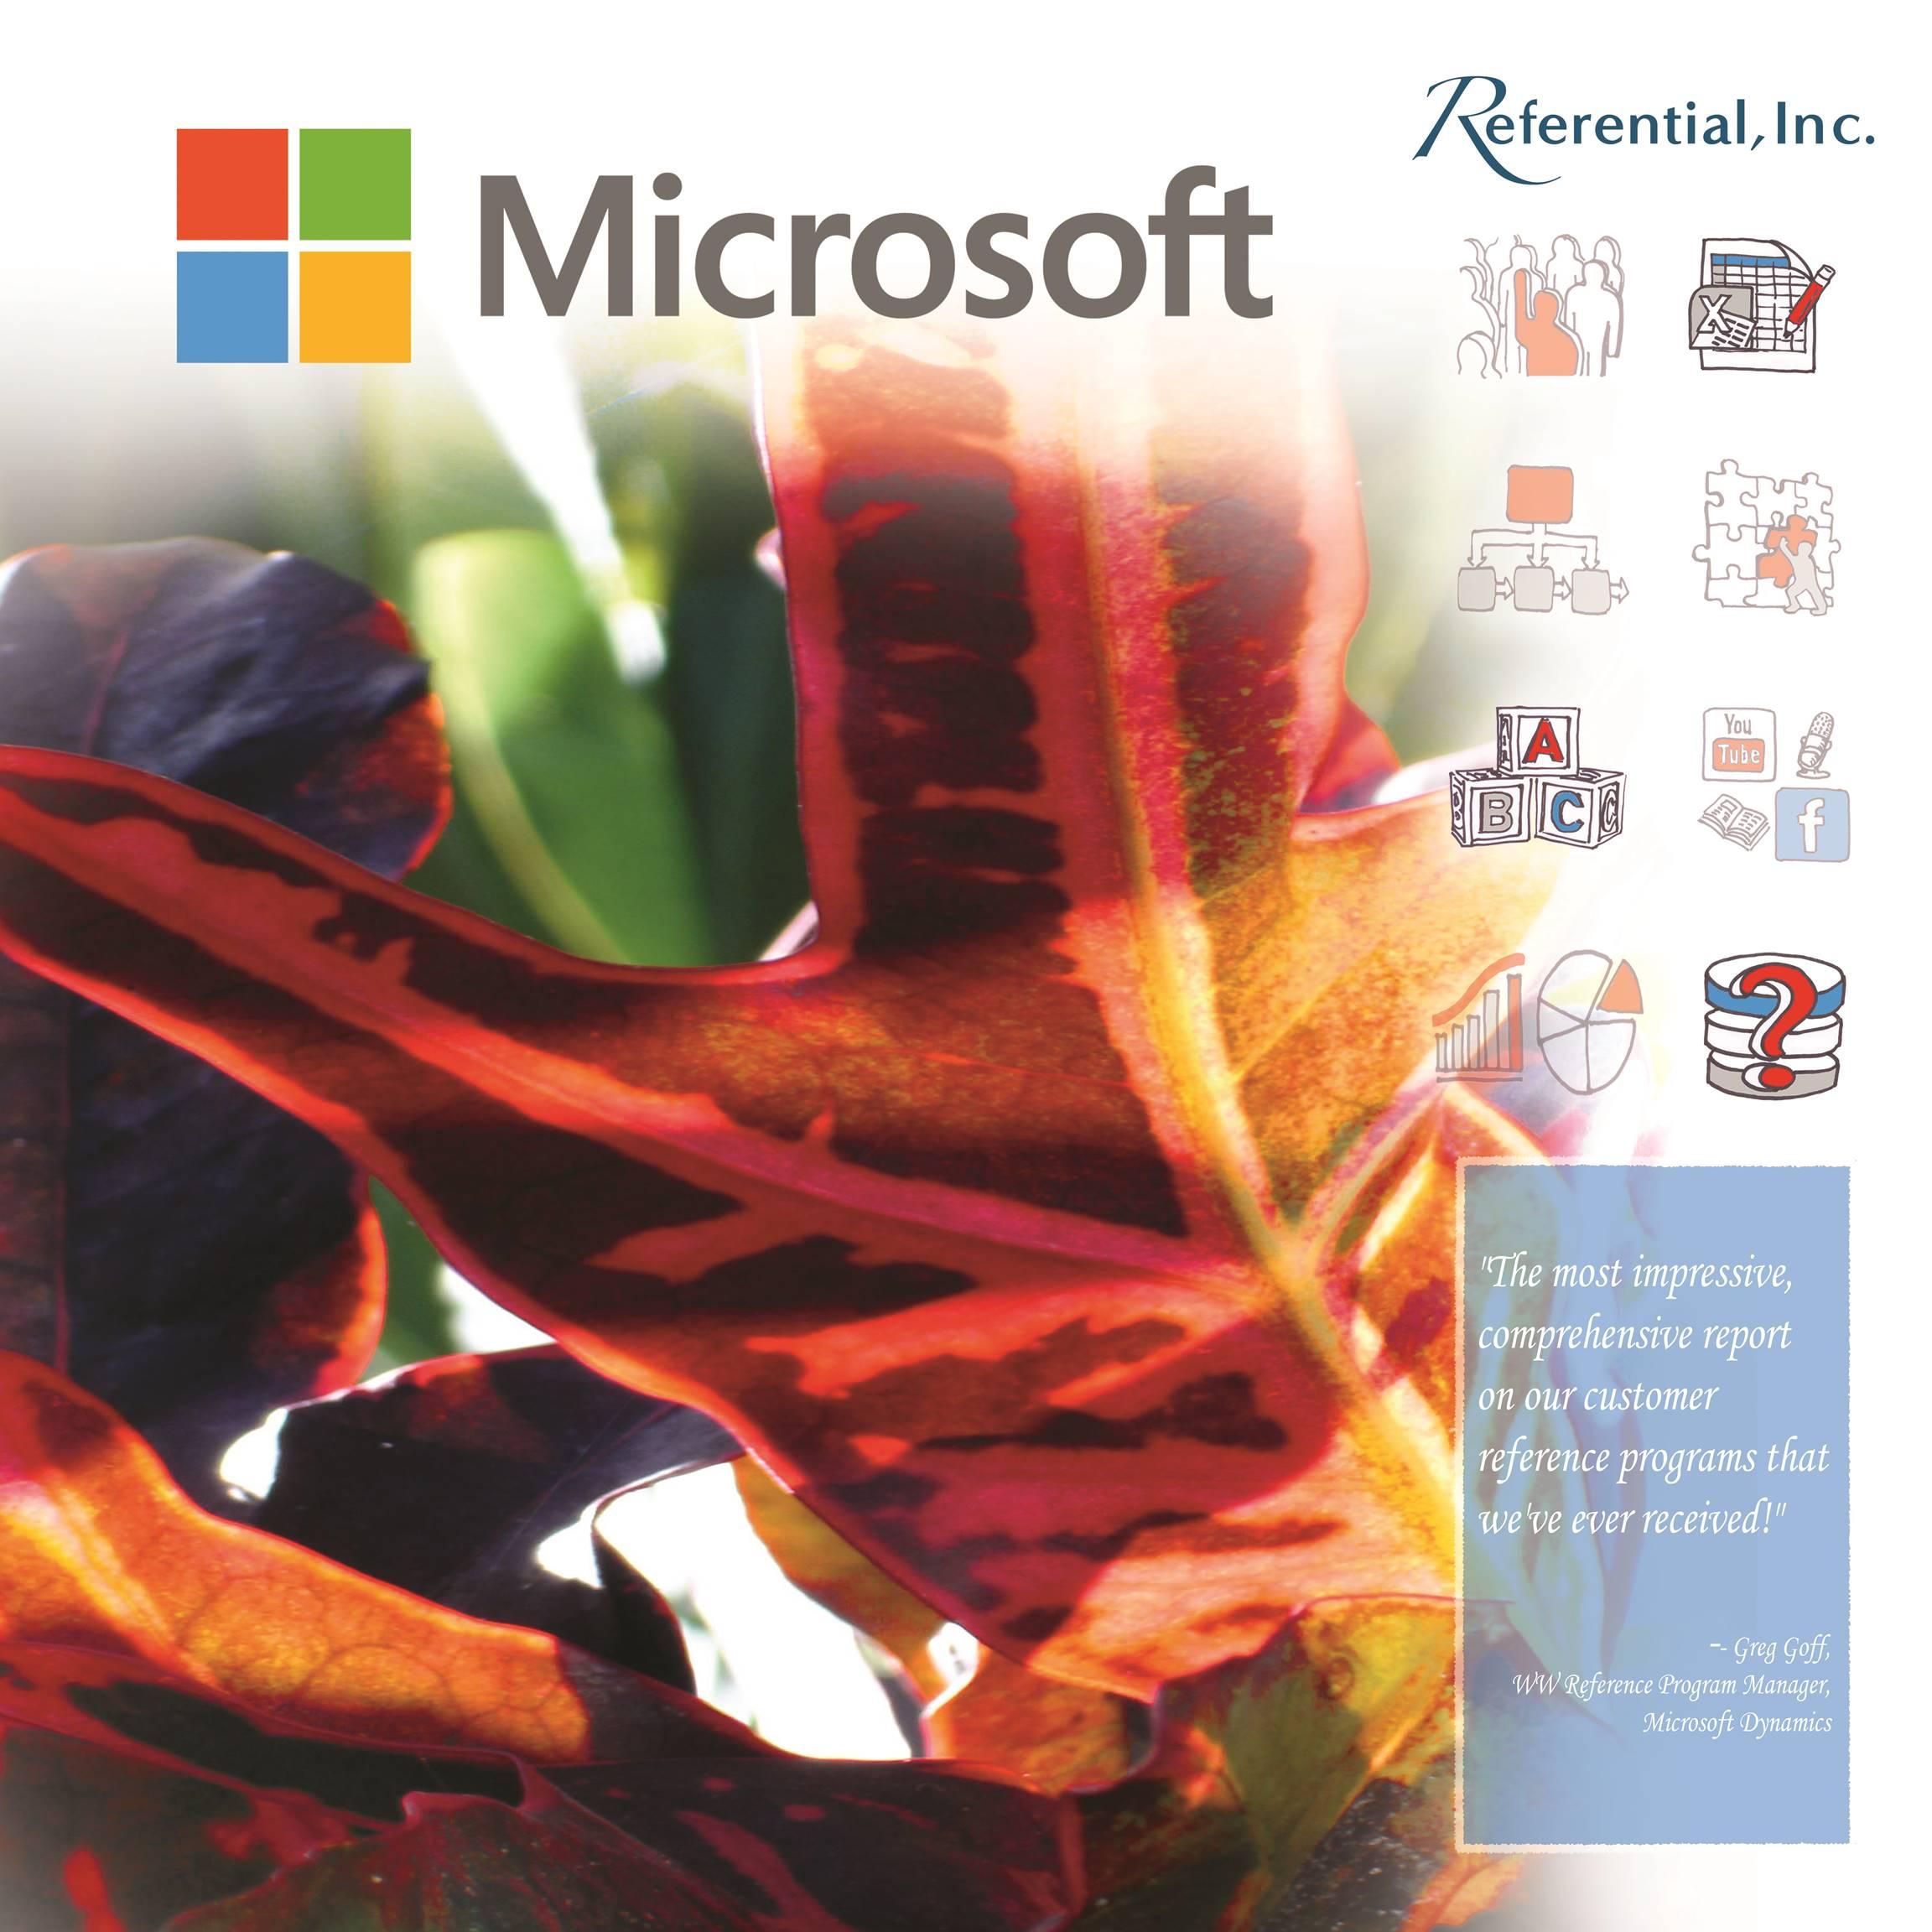 Microsoft in PPT for printing.jpg